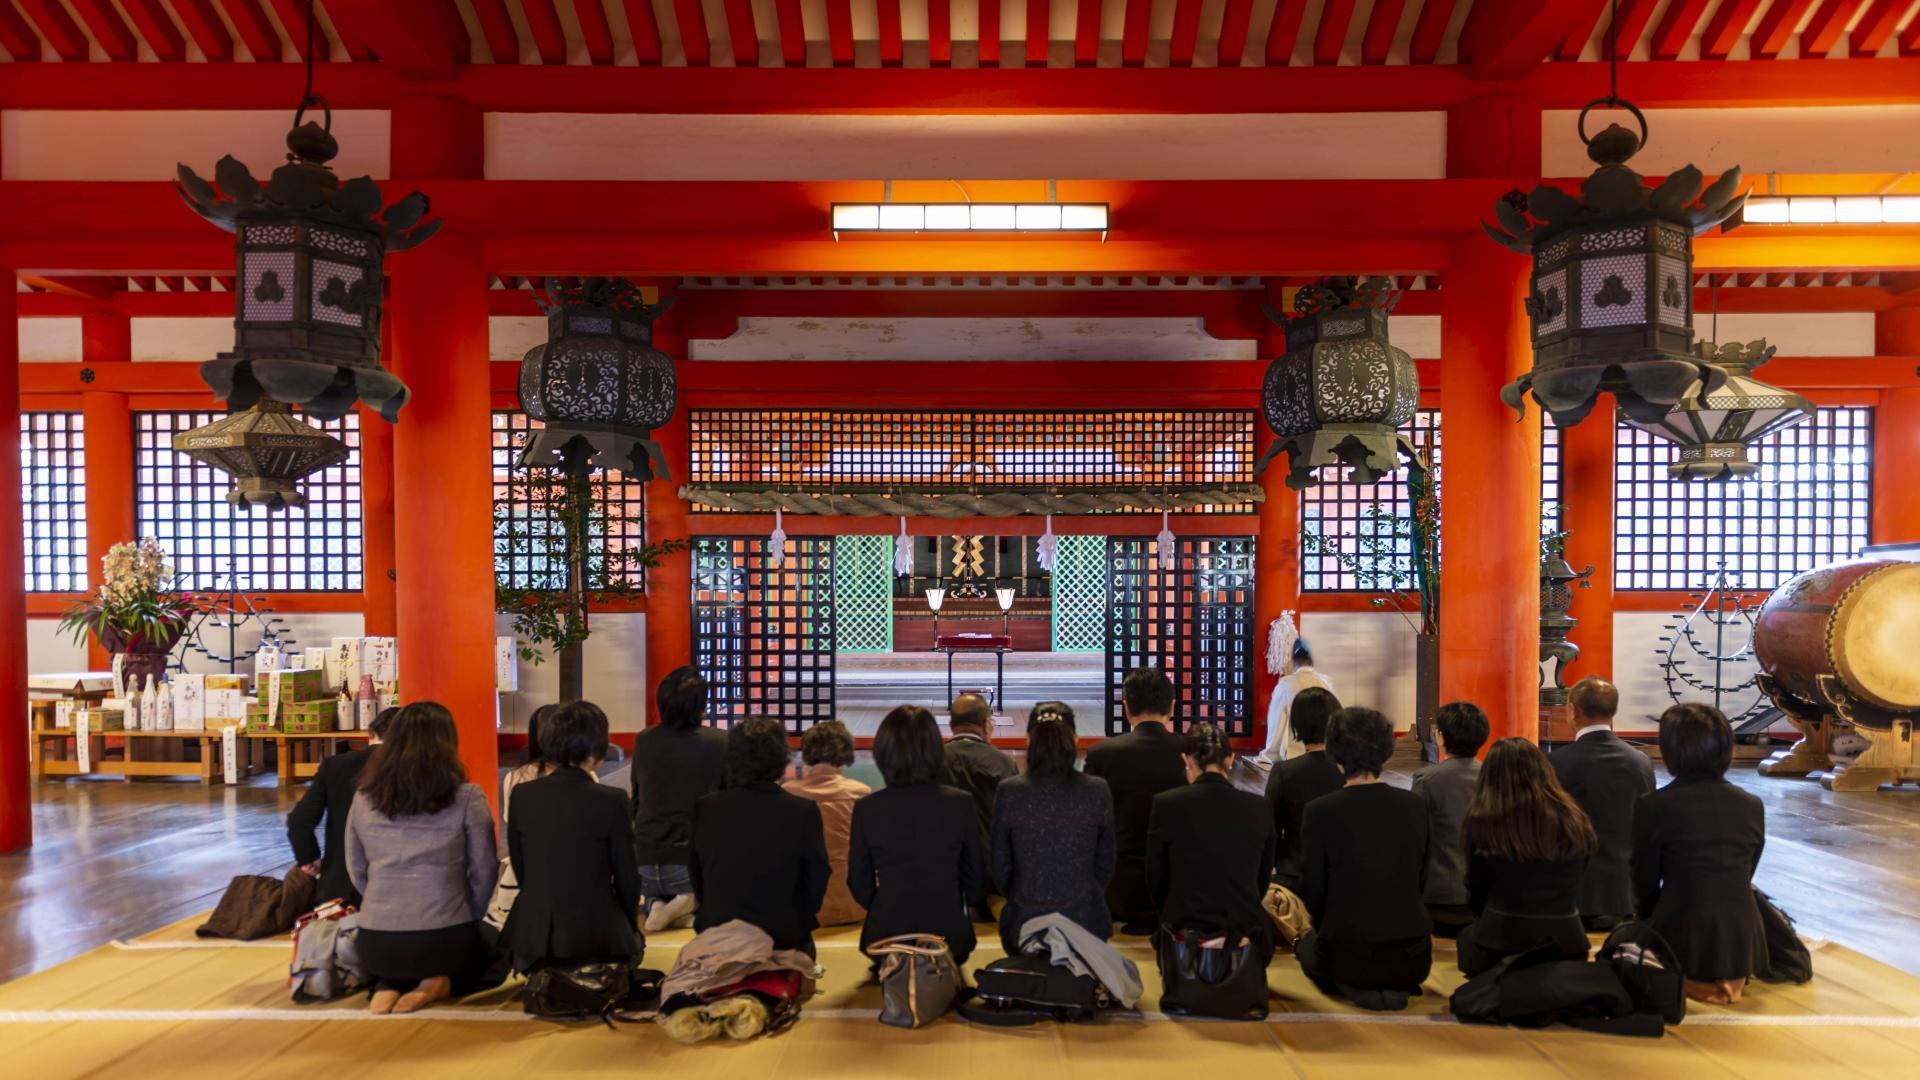 Itsukushima,Schrein, Japan, Asien, Religion, Gebet, Japaner, Temple.